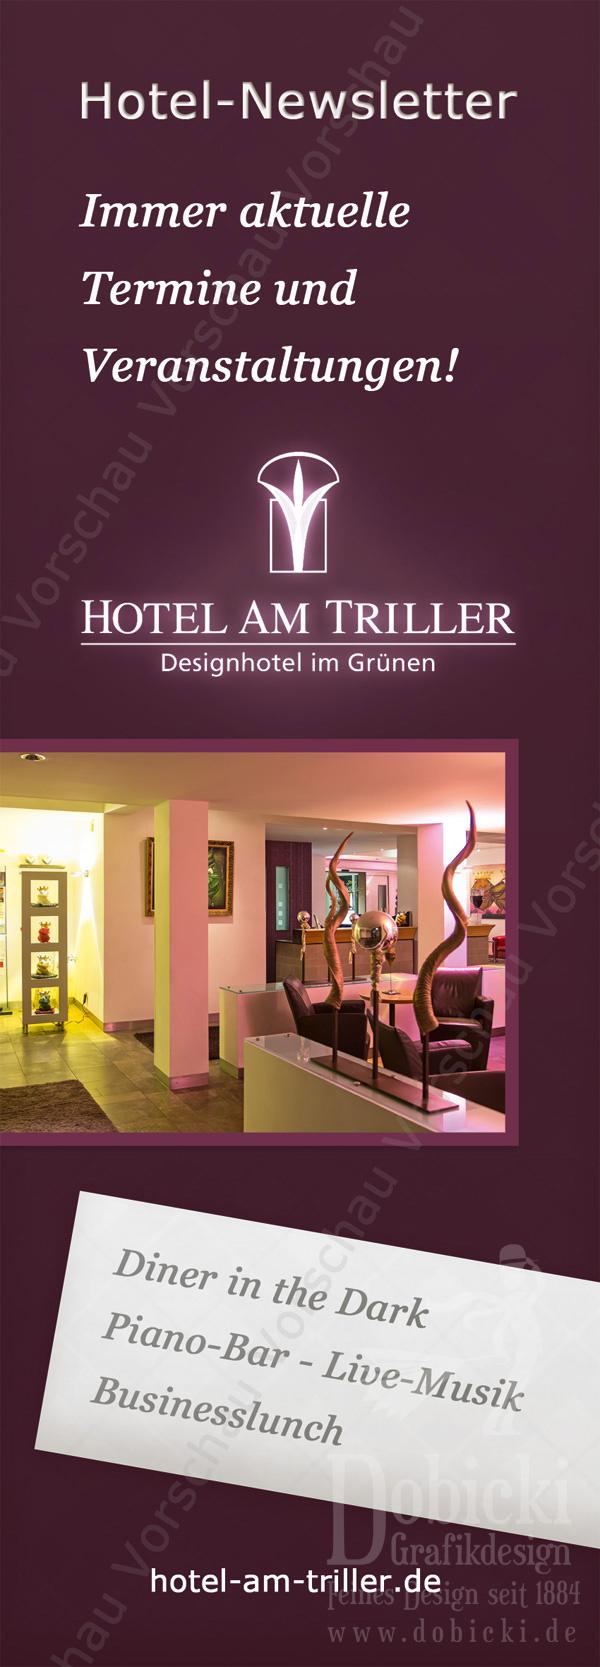 hotel-am-triller-newsletterflyer-_-back-_-2.jpg